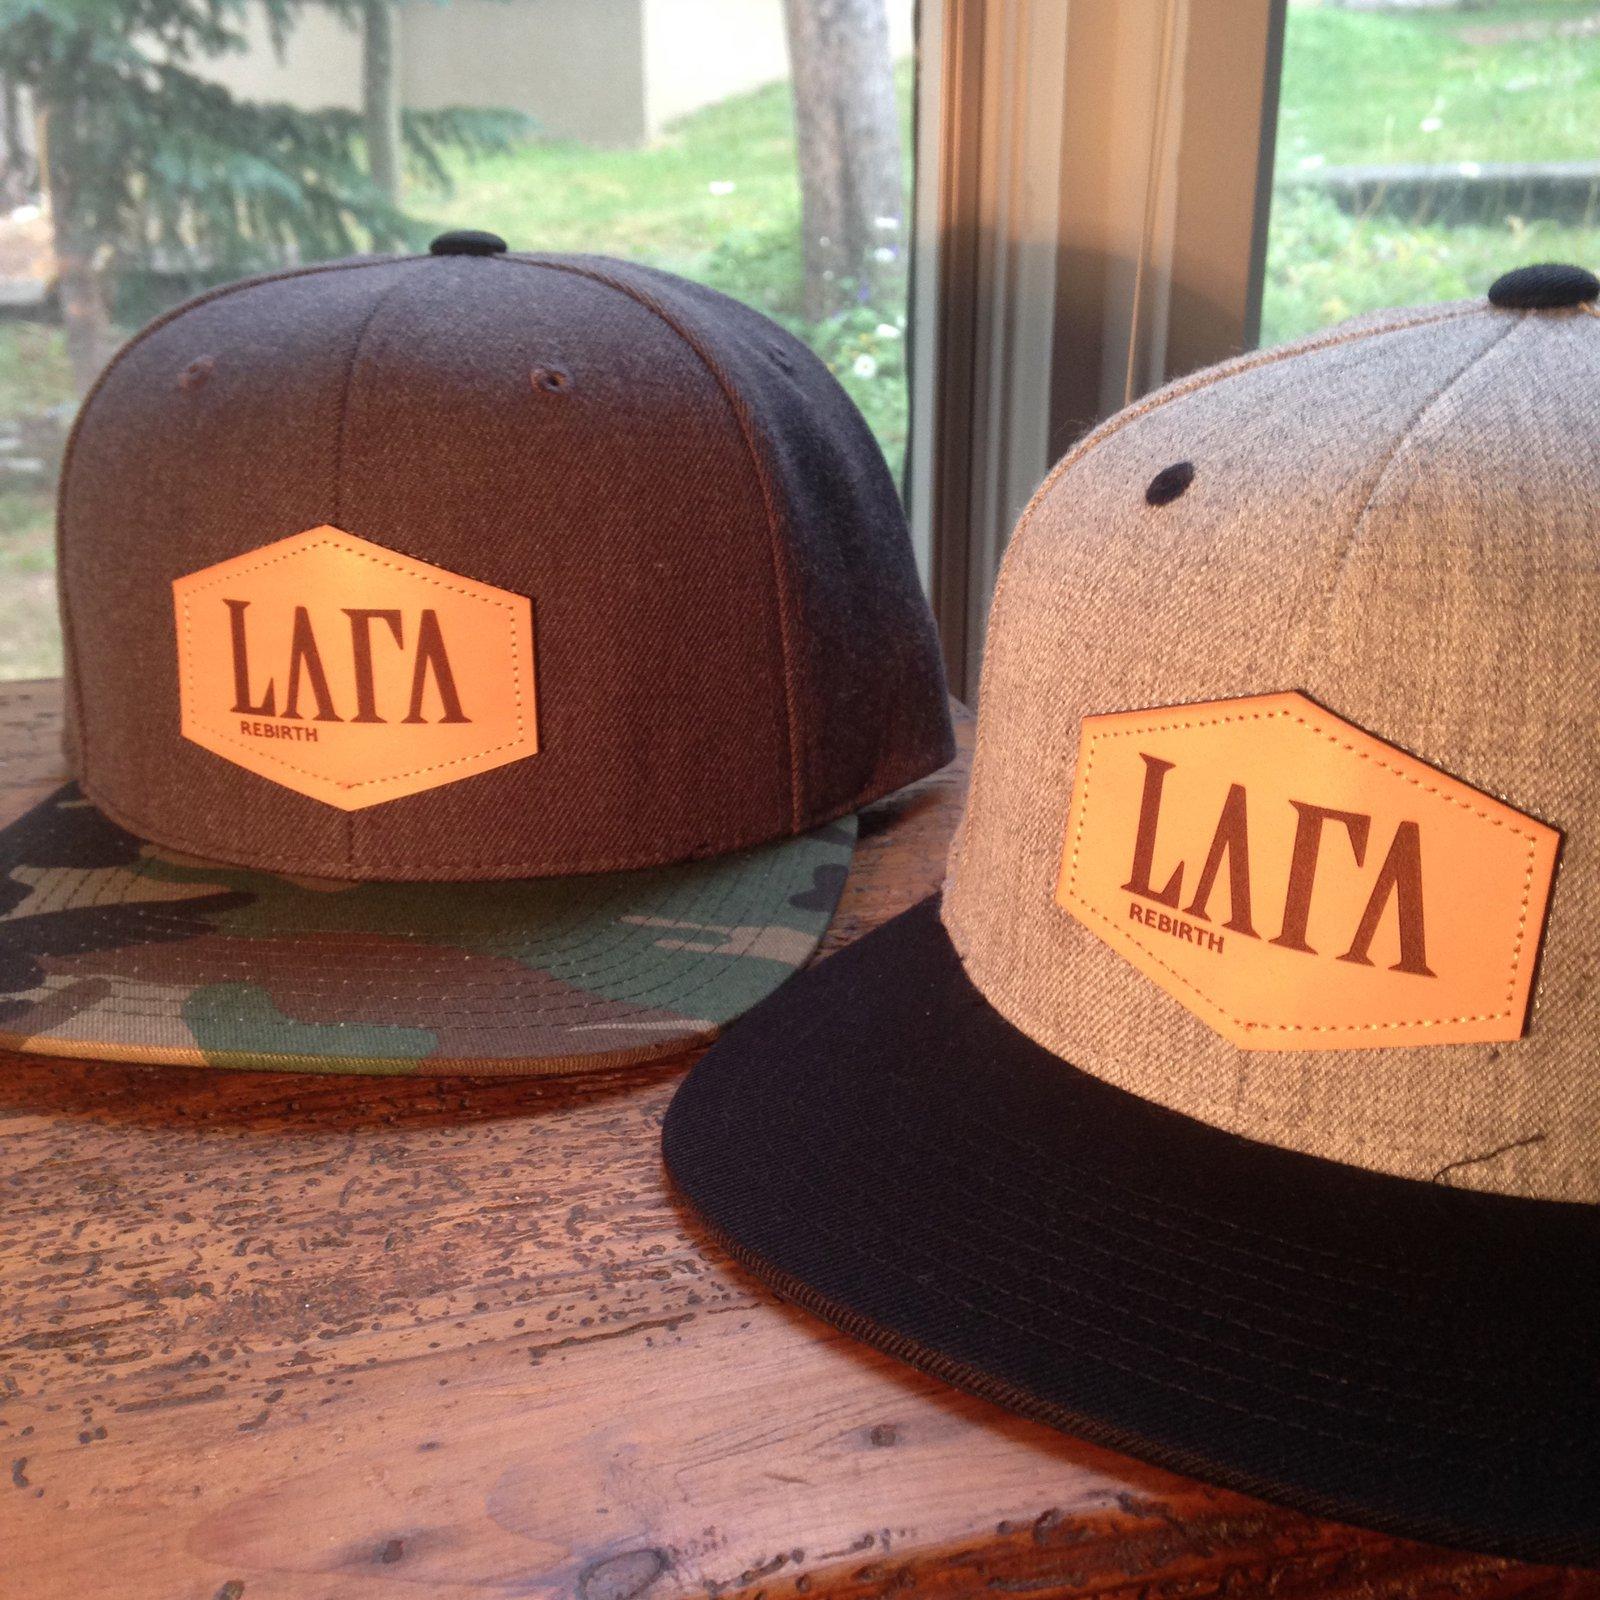 "New La Fa ""Rebirth"" snapbacks"